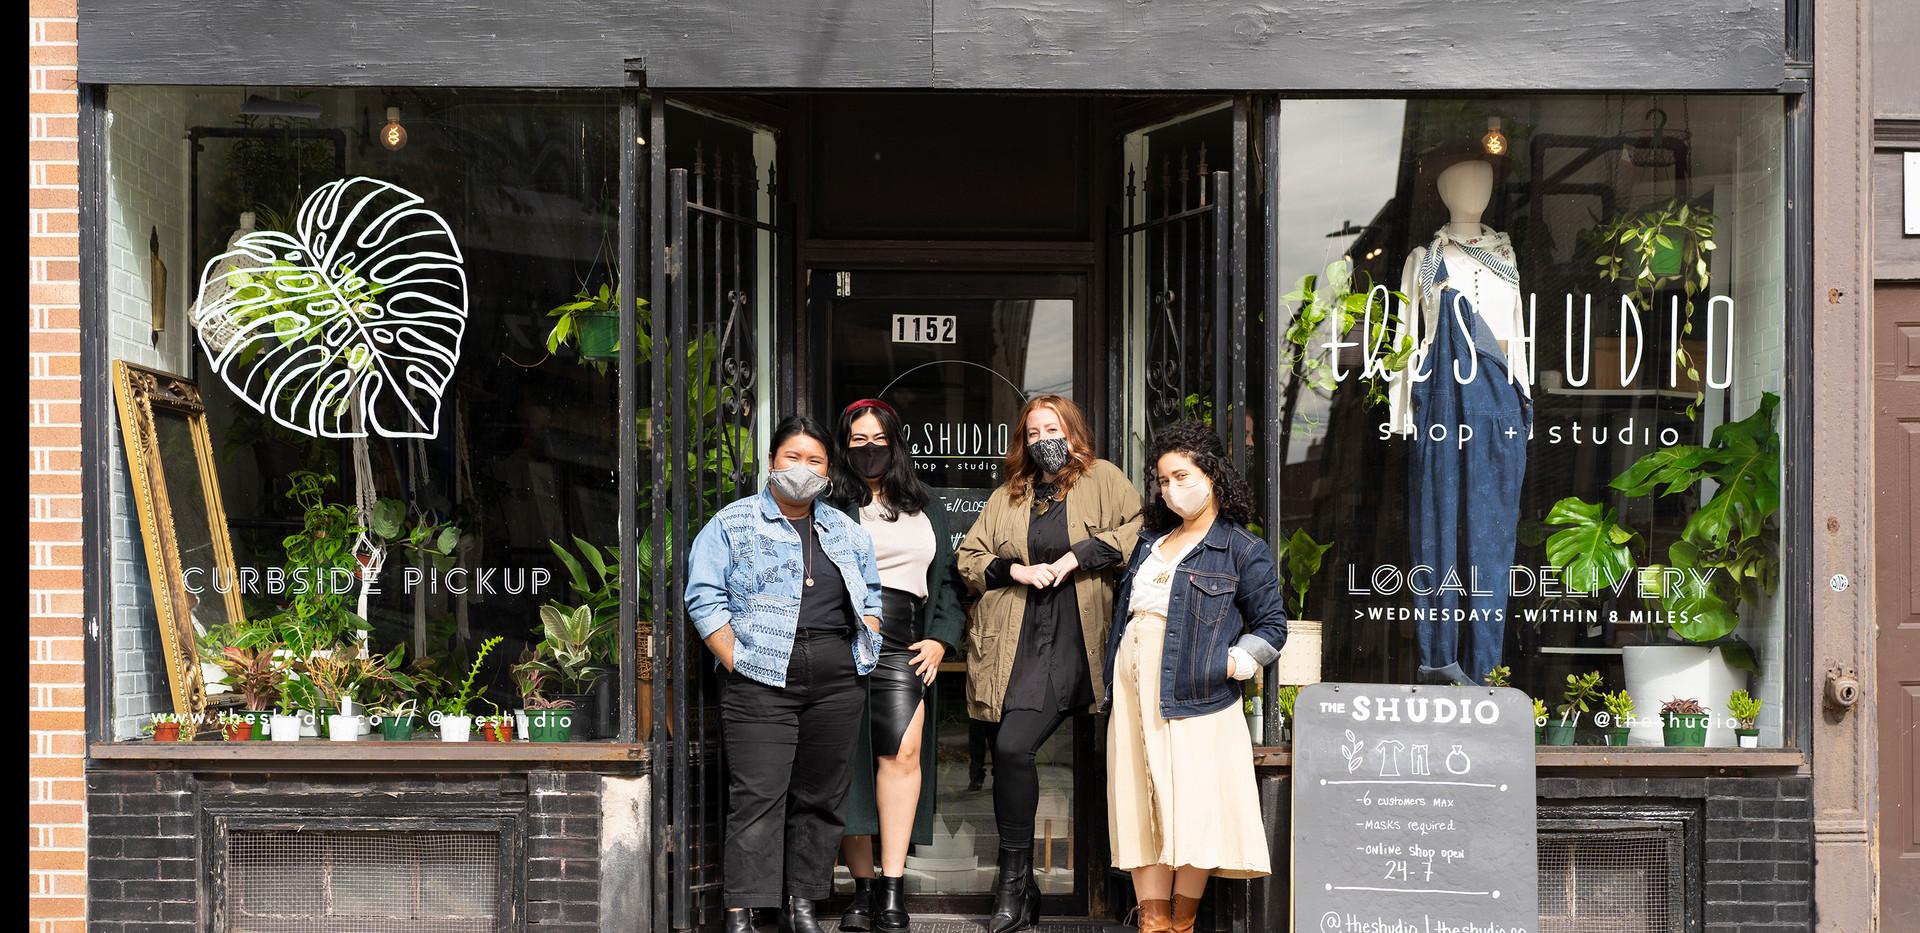 the Shudio | Shop + Studio